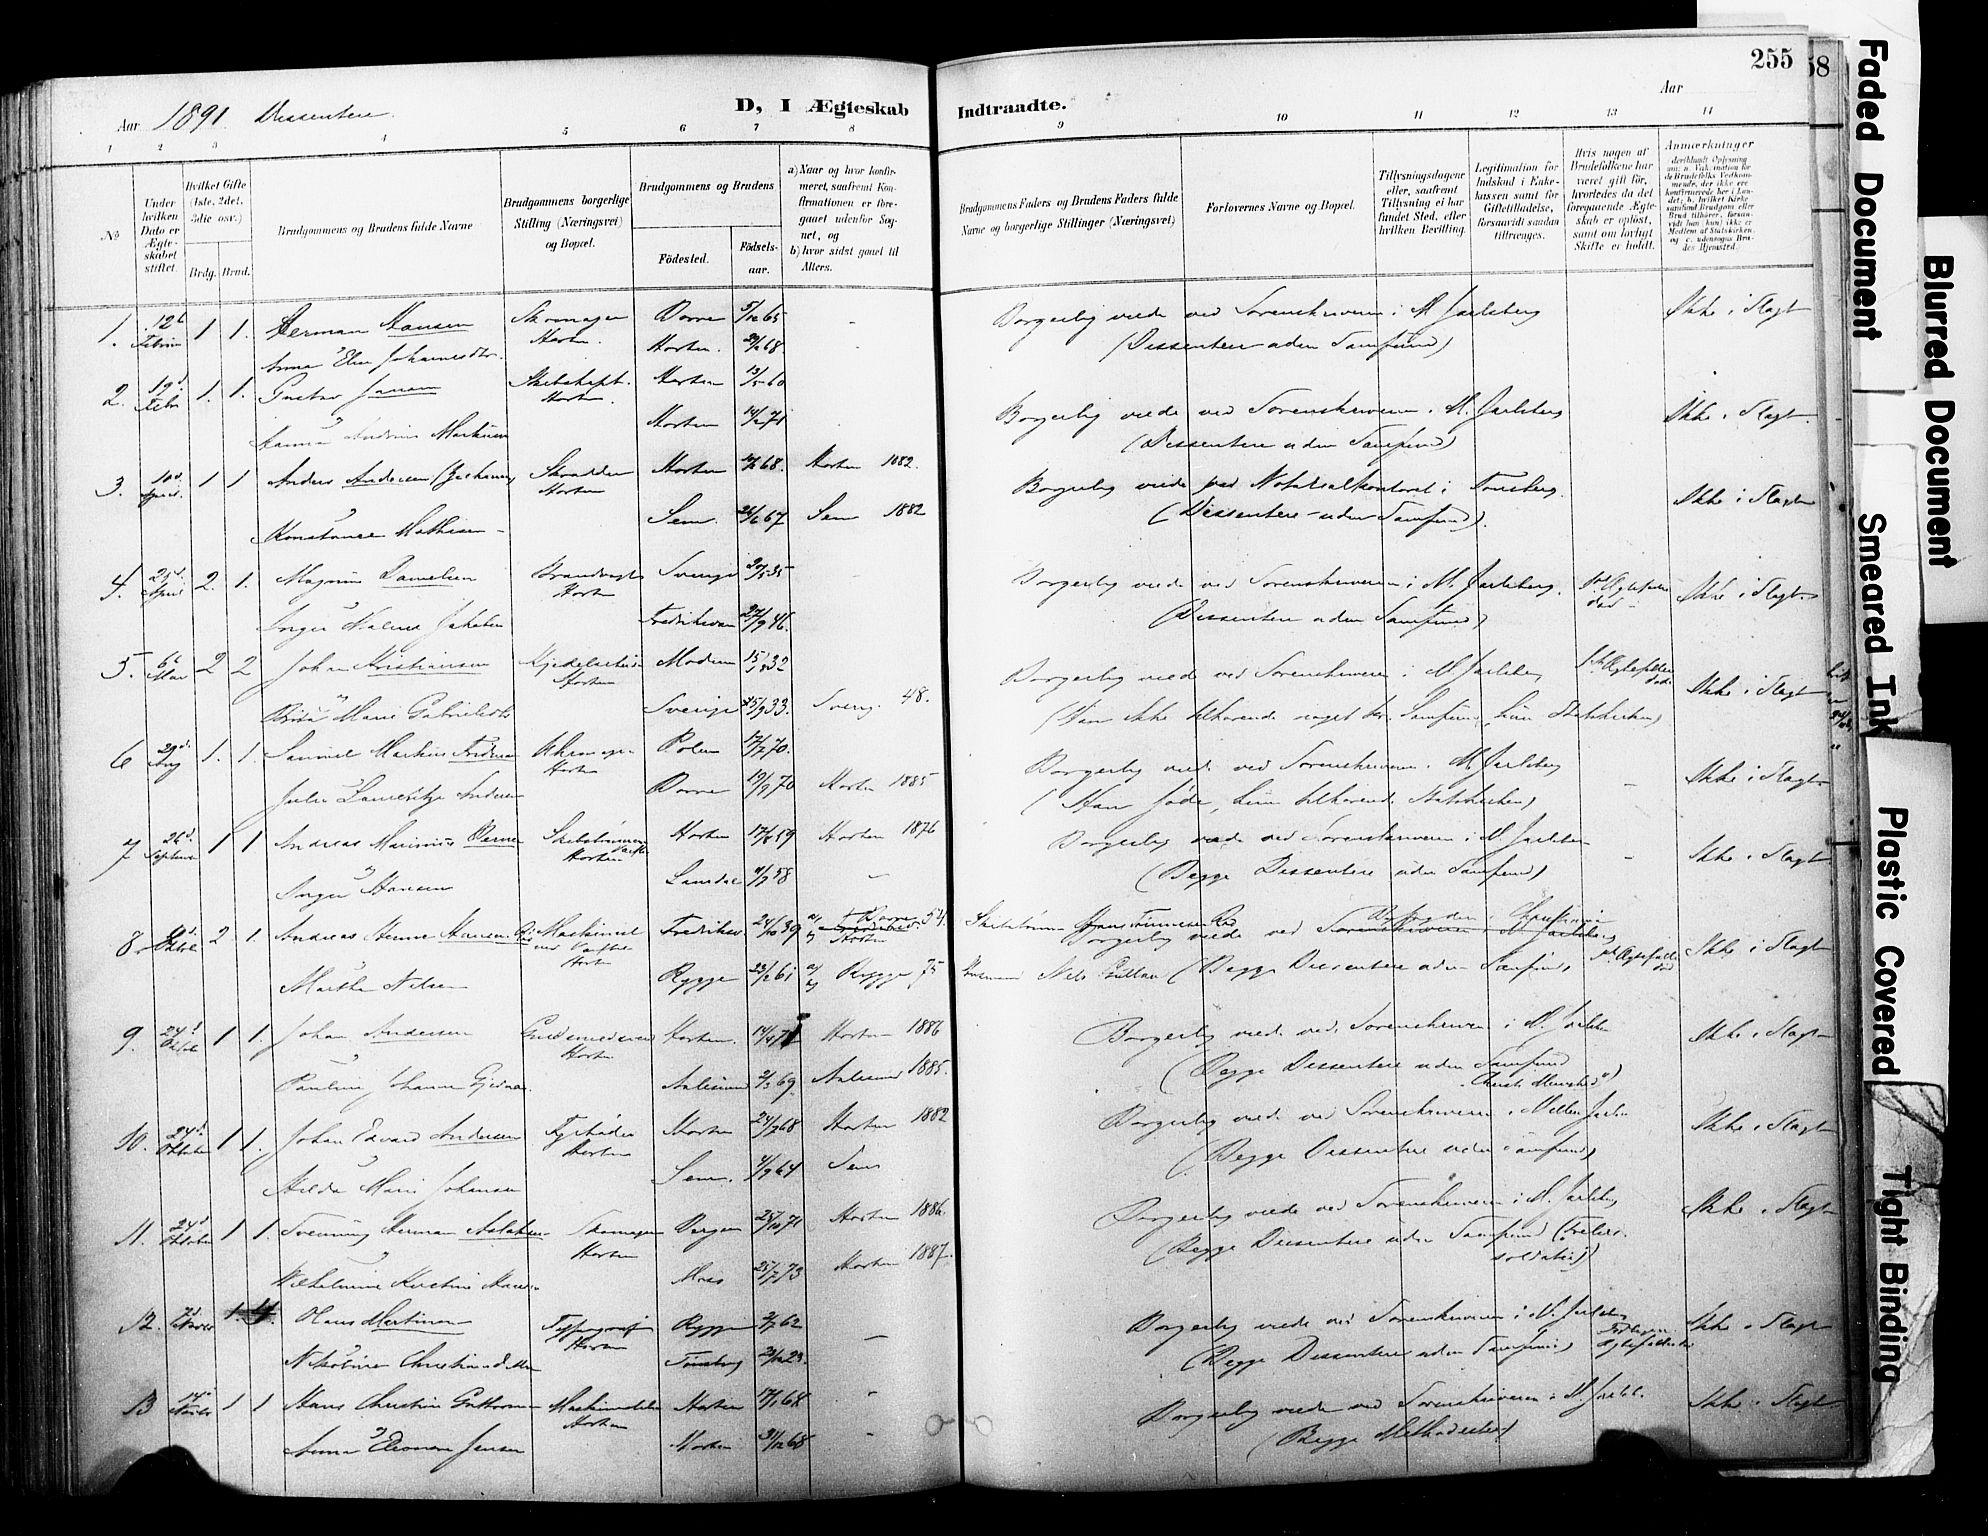 SAKO, Horten kirkebøker, F/Fa/L0004: Parish register (official) no. 4, 1888-1895, p. 255